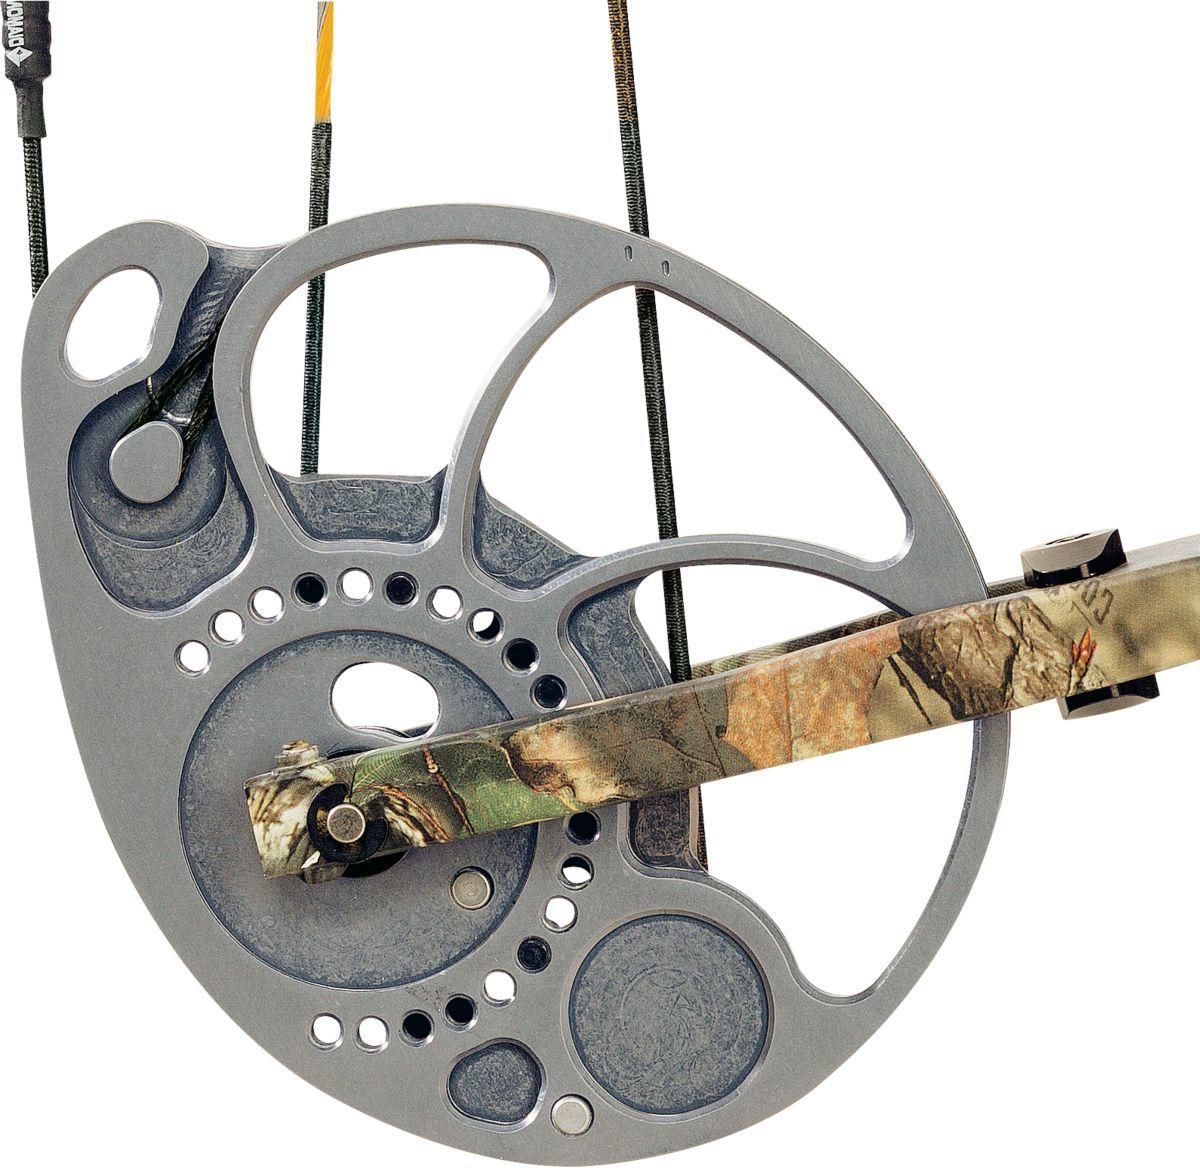 Diamond Archery Edge SB-1 Camo Package